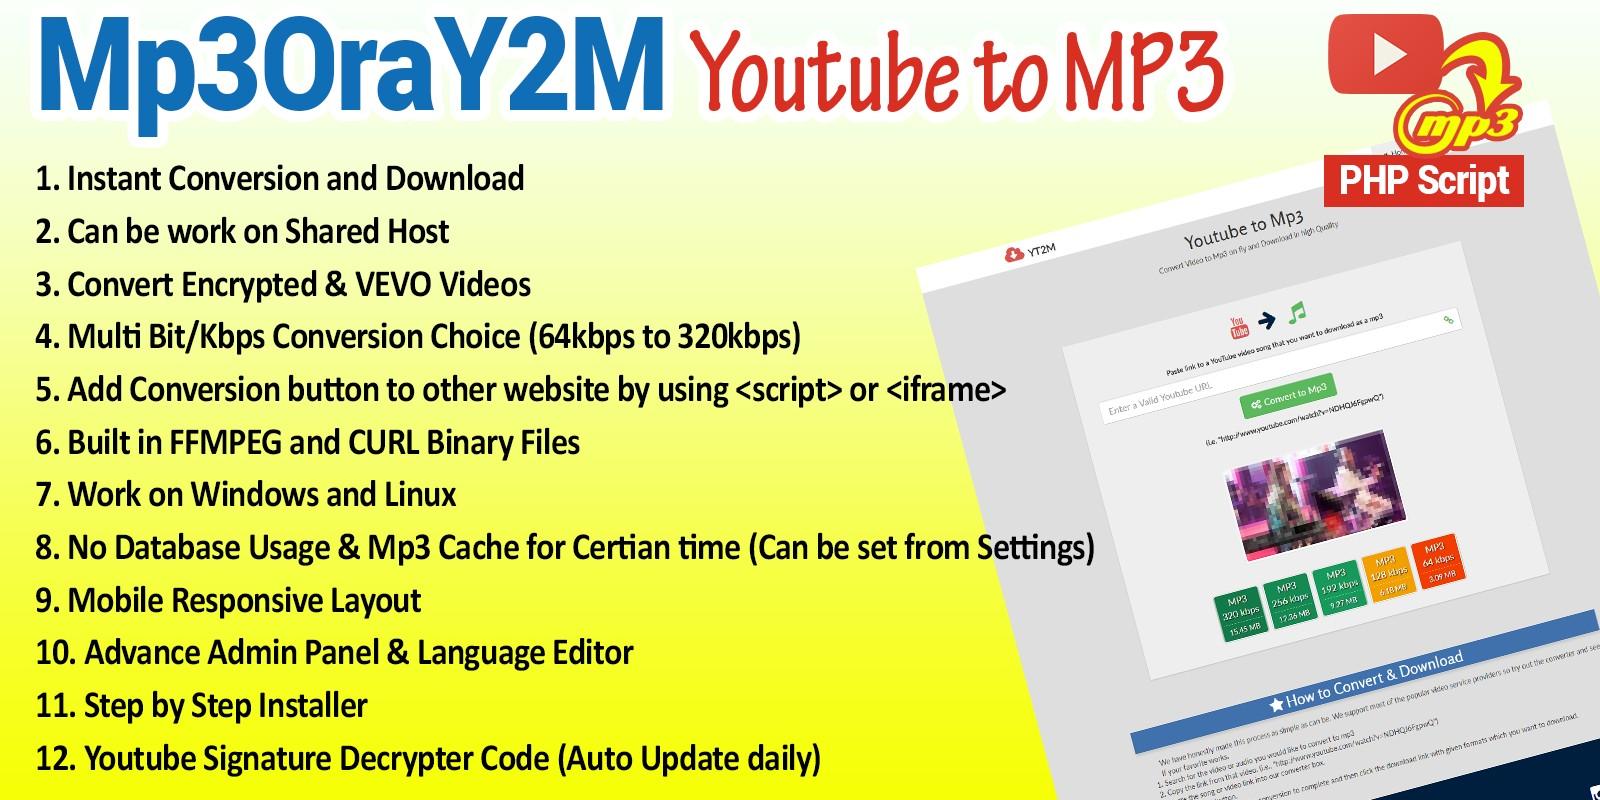 MP3OraY2M - Youtube to Mp3